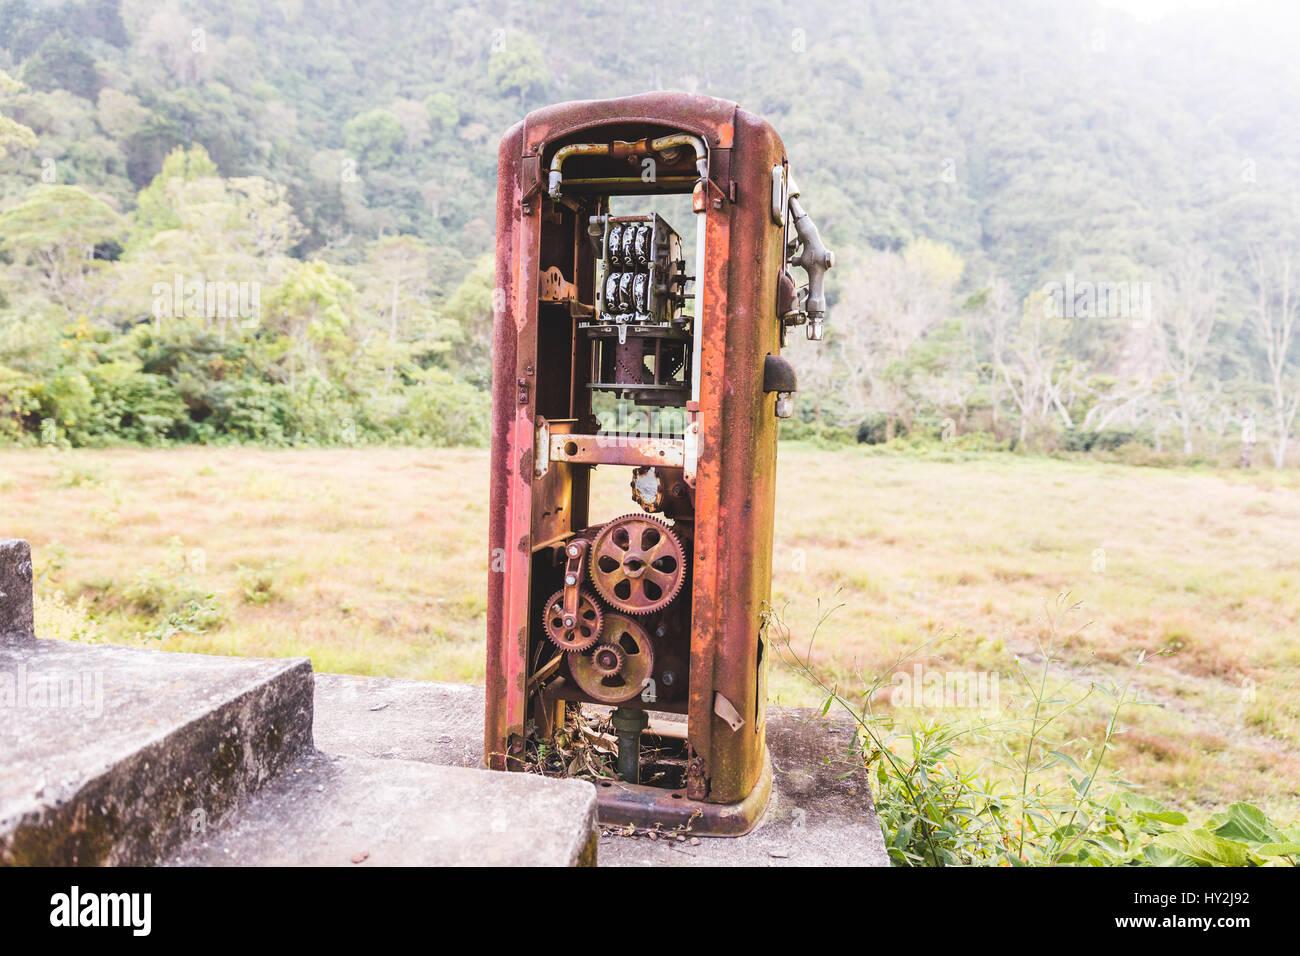 Heavily rusted, antique gas pump in the remote jungle near Lake Atitlan, Guatemala, Central America. - Stock Image